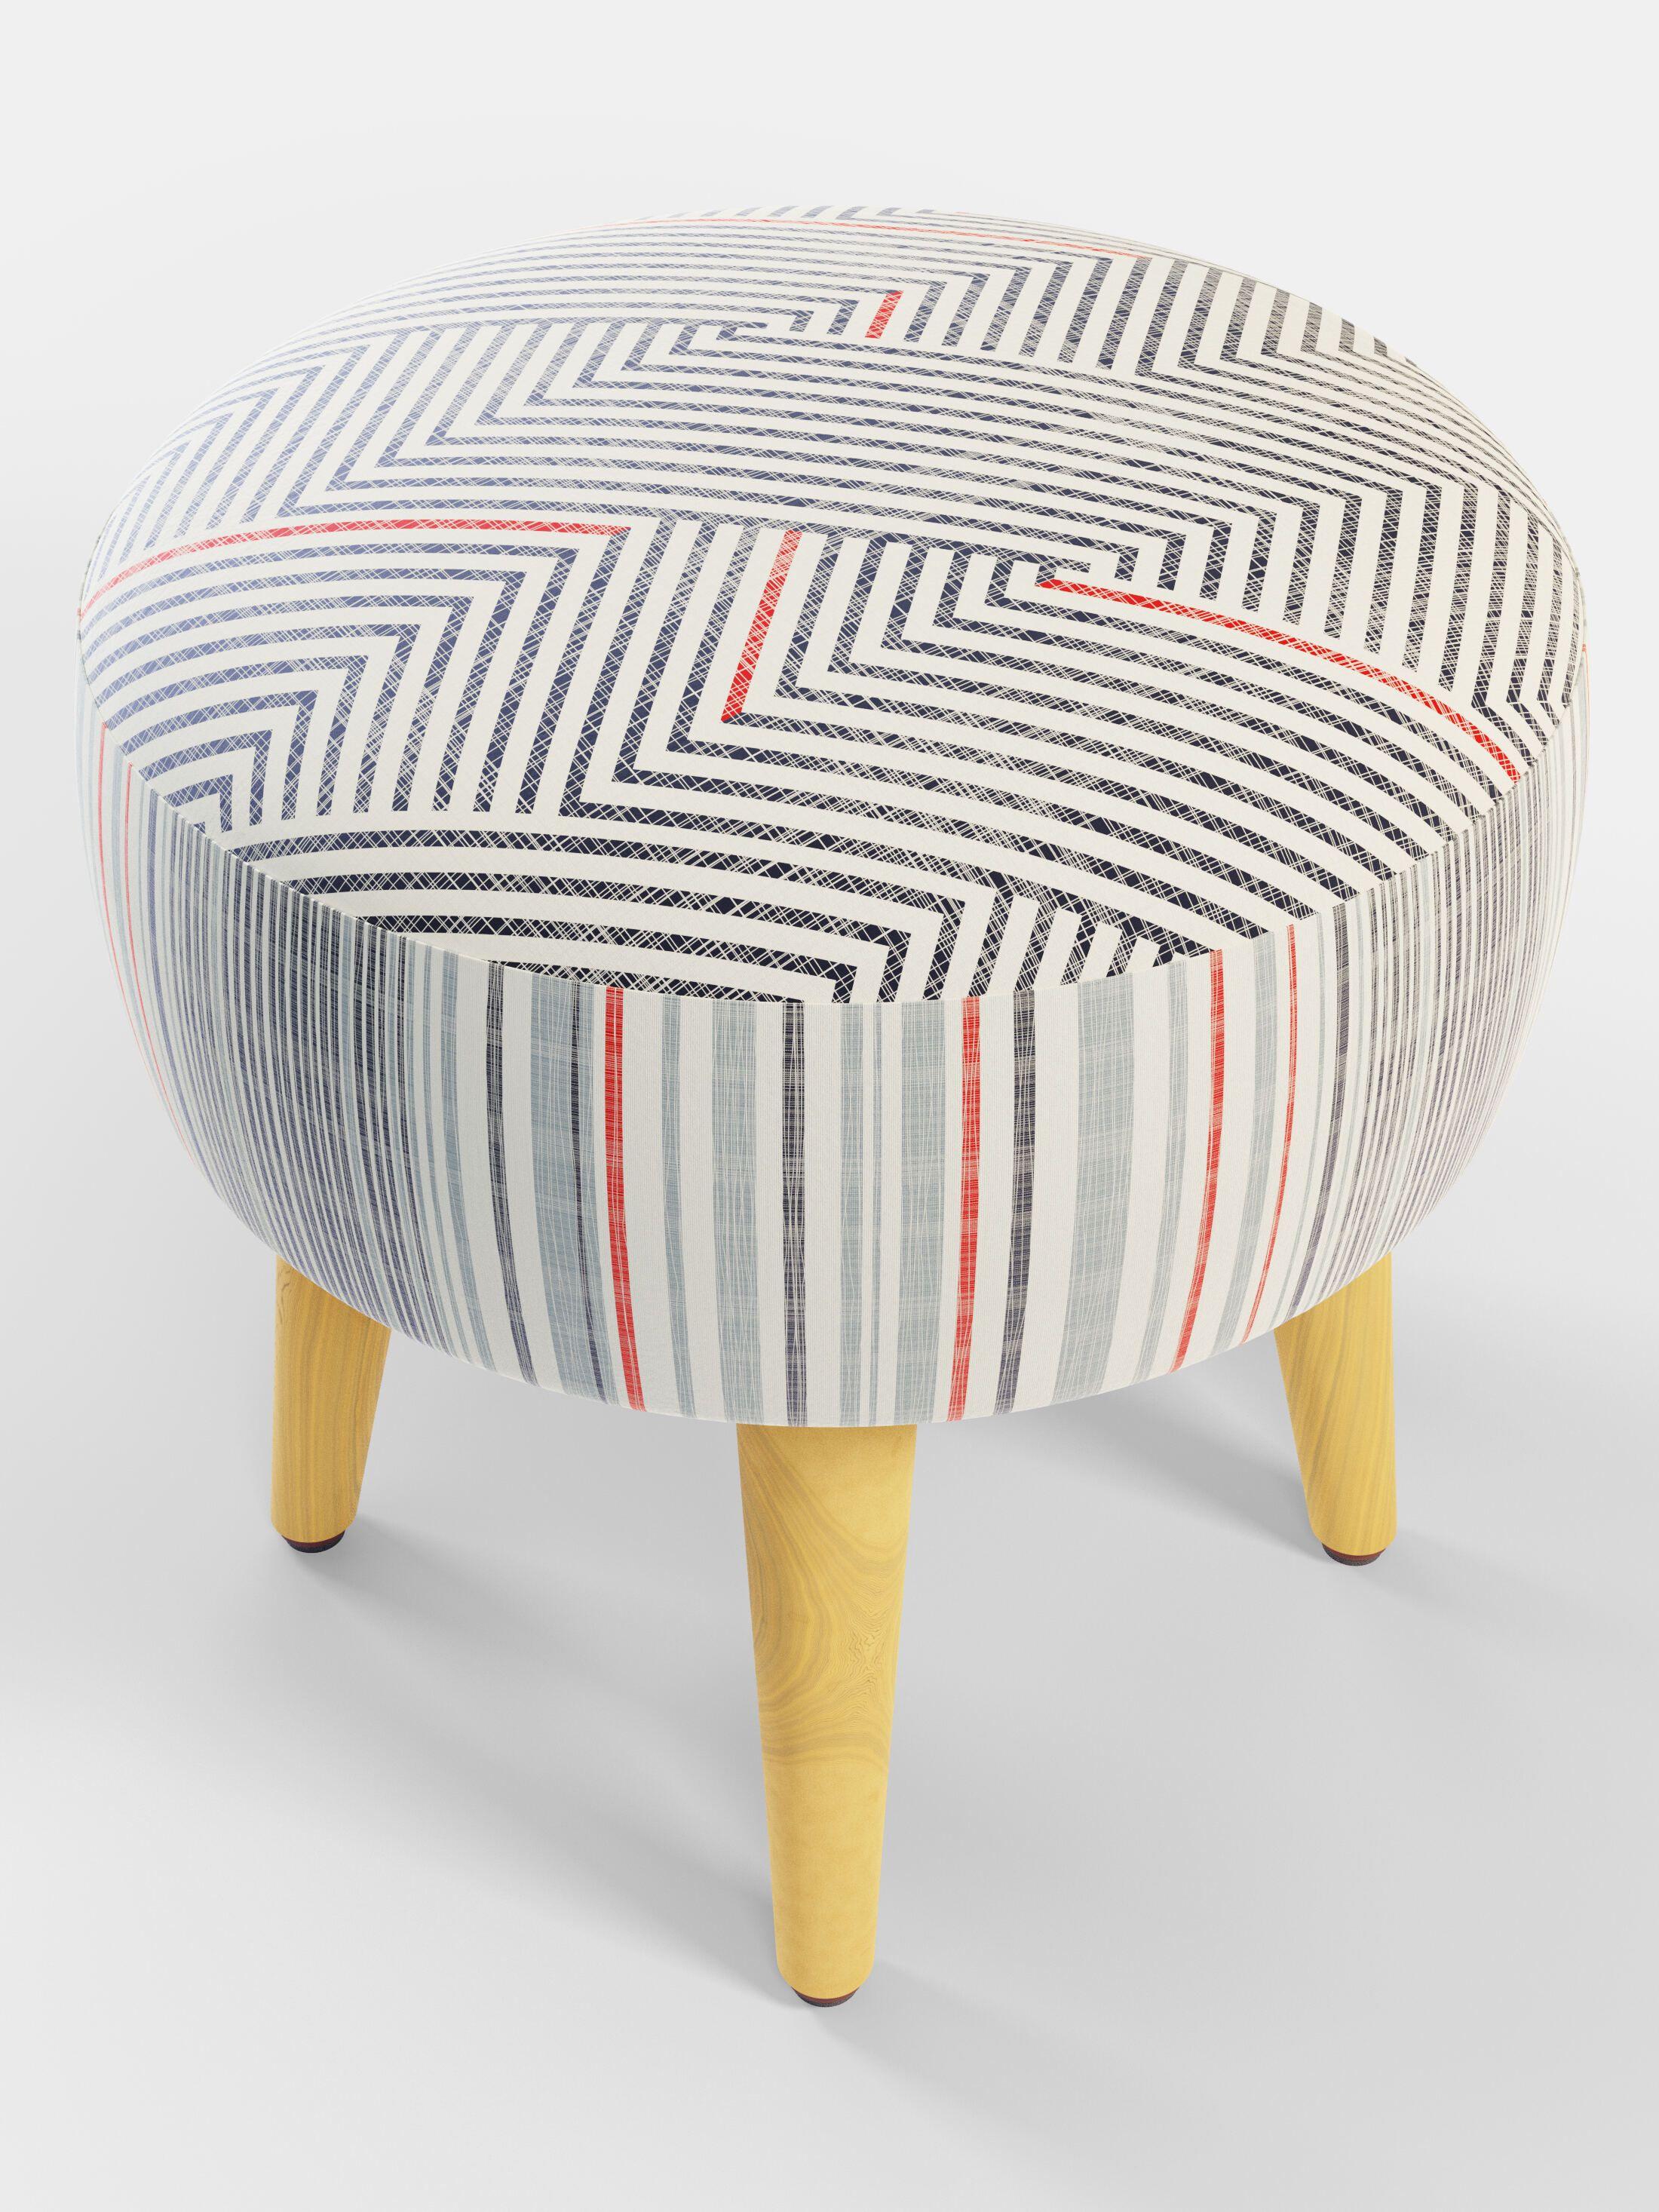 bespoke ottoman footstool